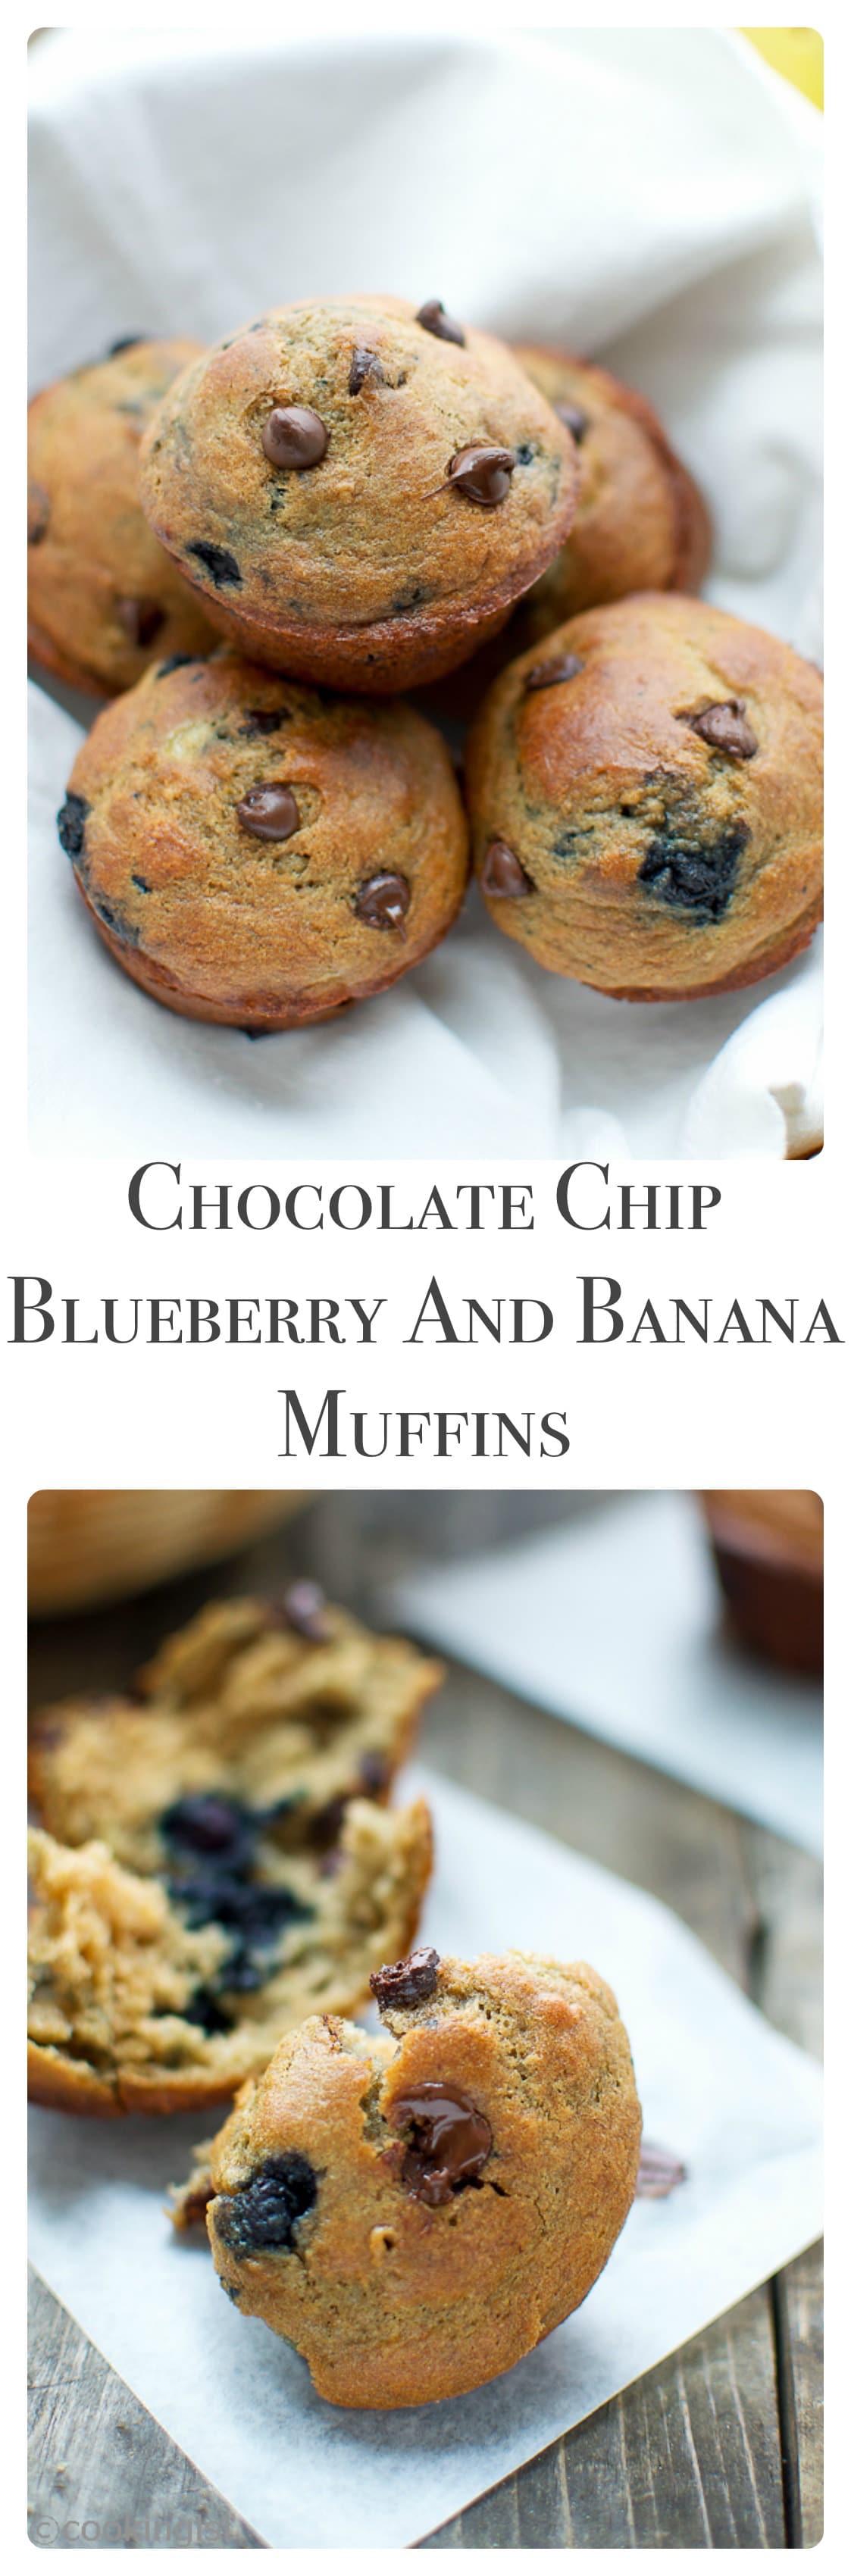 Chocolate-Chip-Banana-Blueberry-Muffins